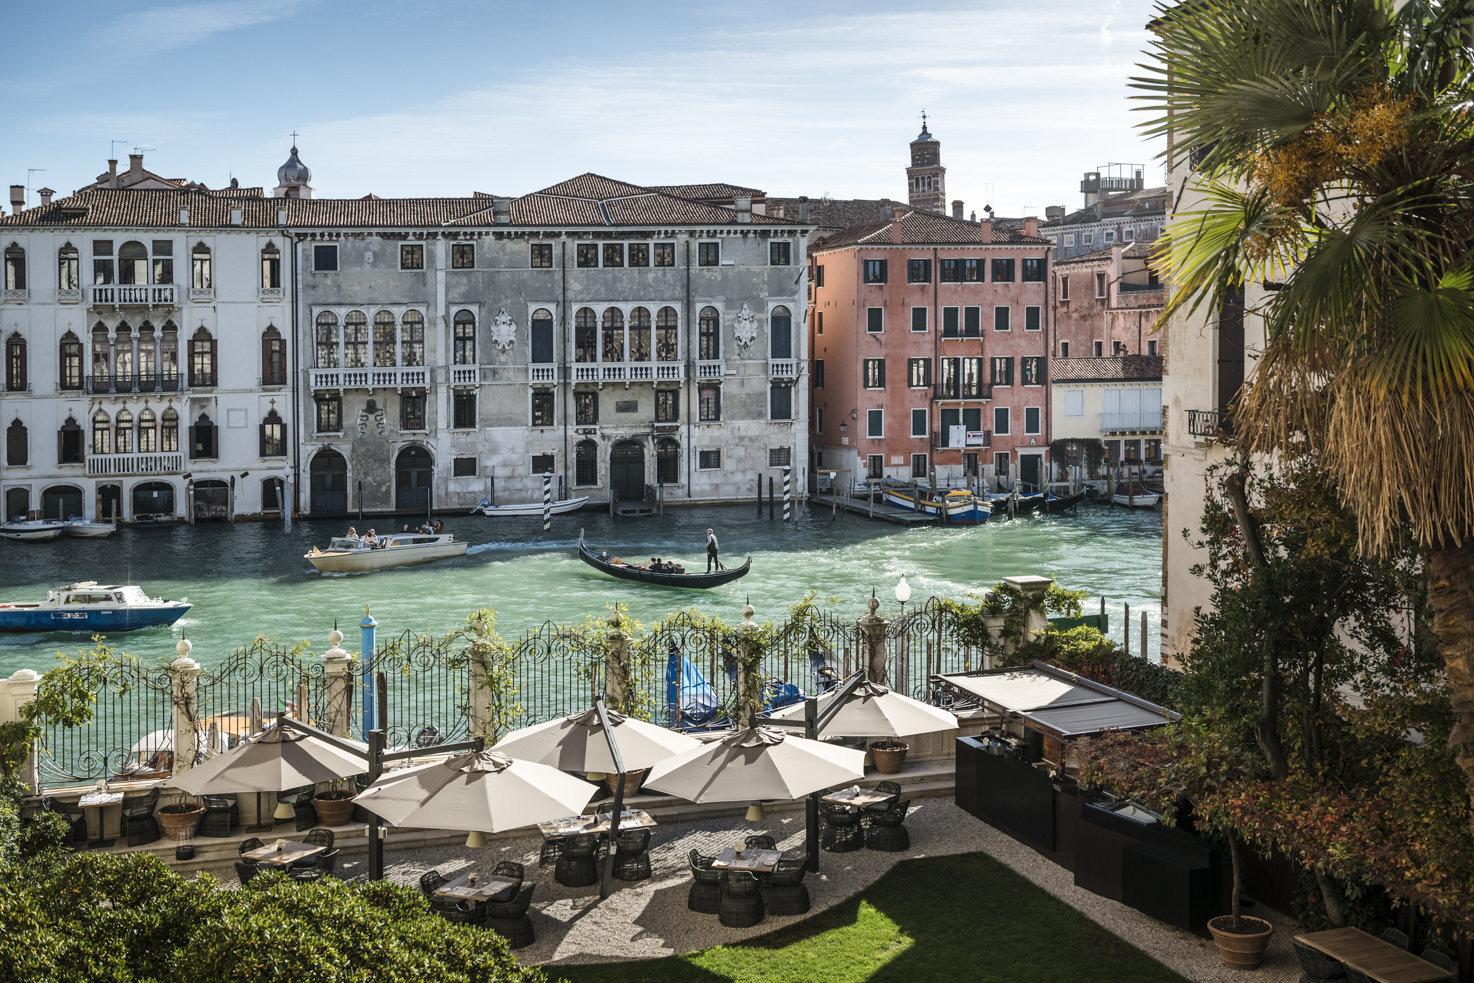 Aman Hotel, Venice